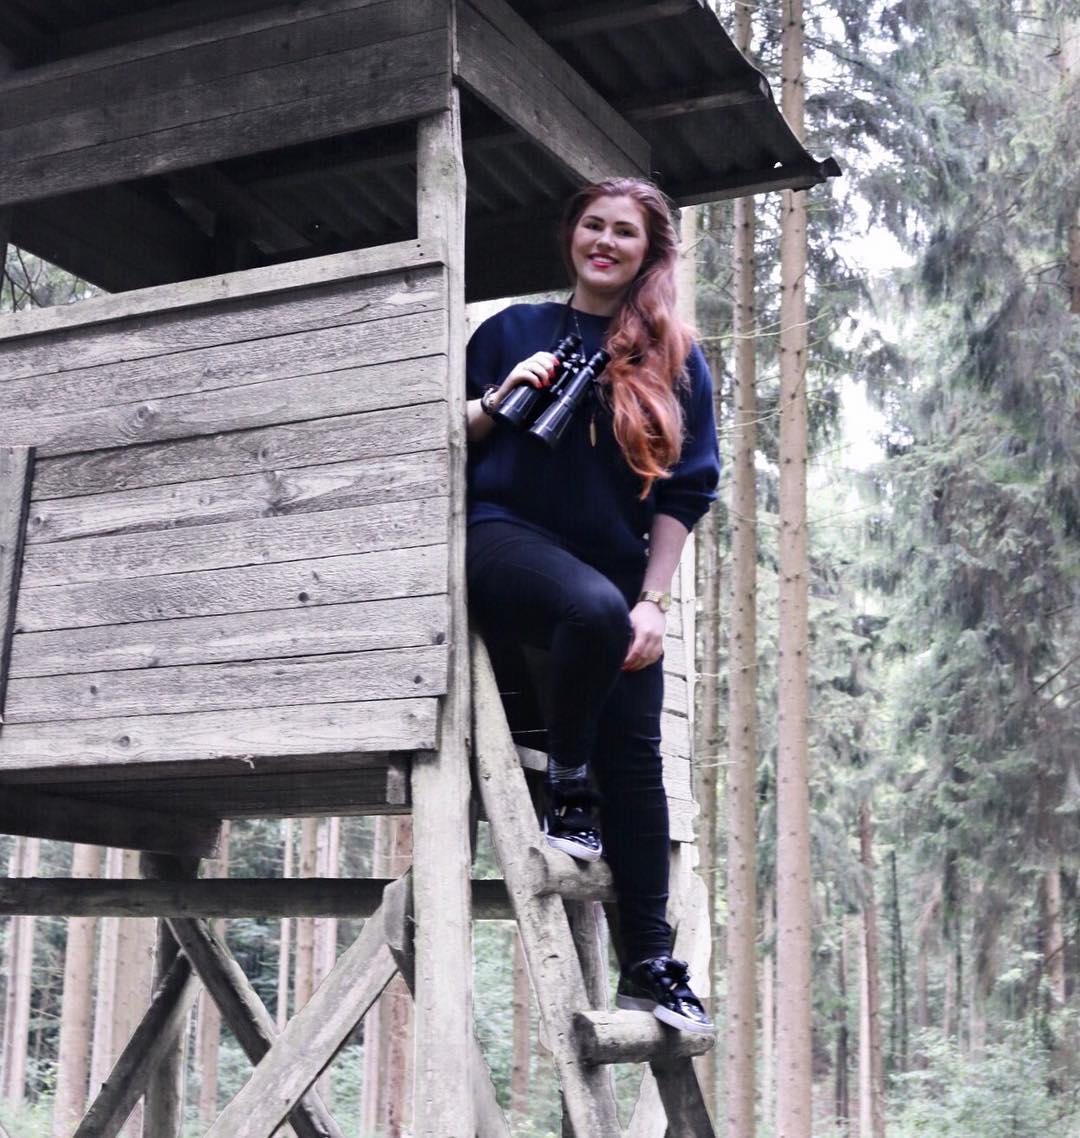 Wildbeobachtung-Gasthof-Freden-Bad-Iburg